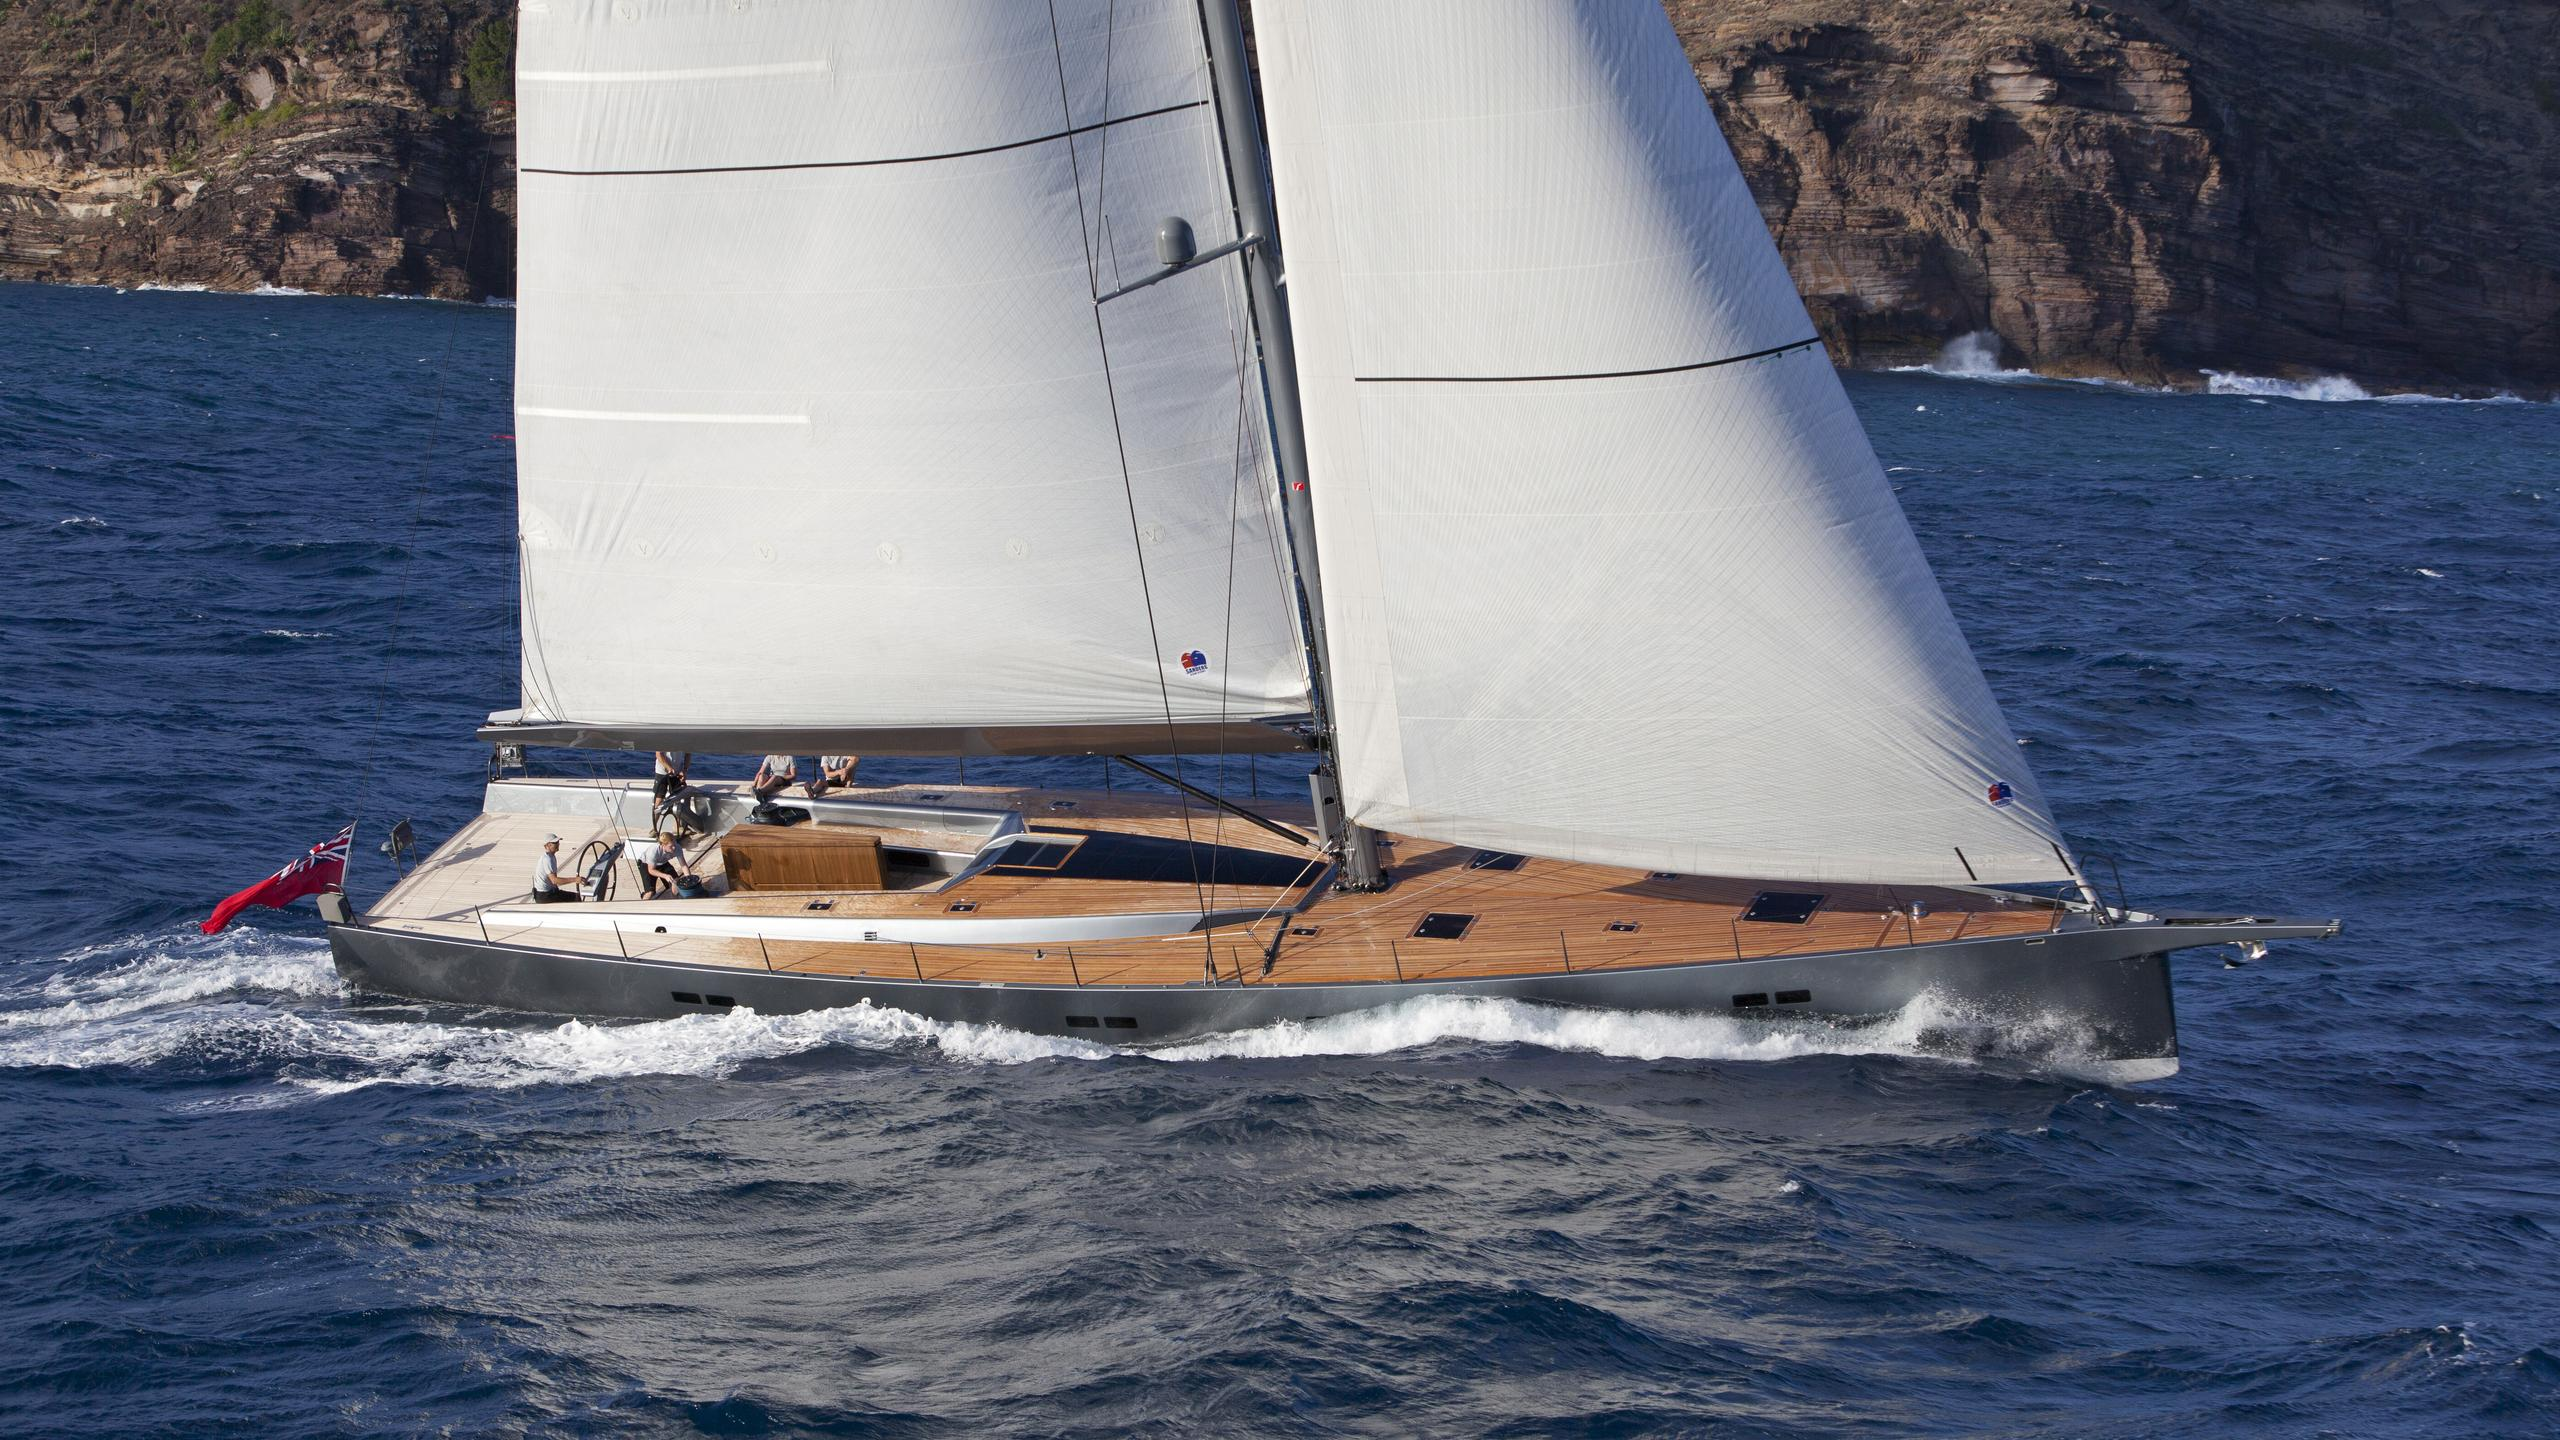 aegir-yacht-for-charter-profile